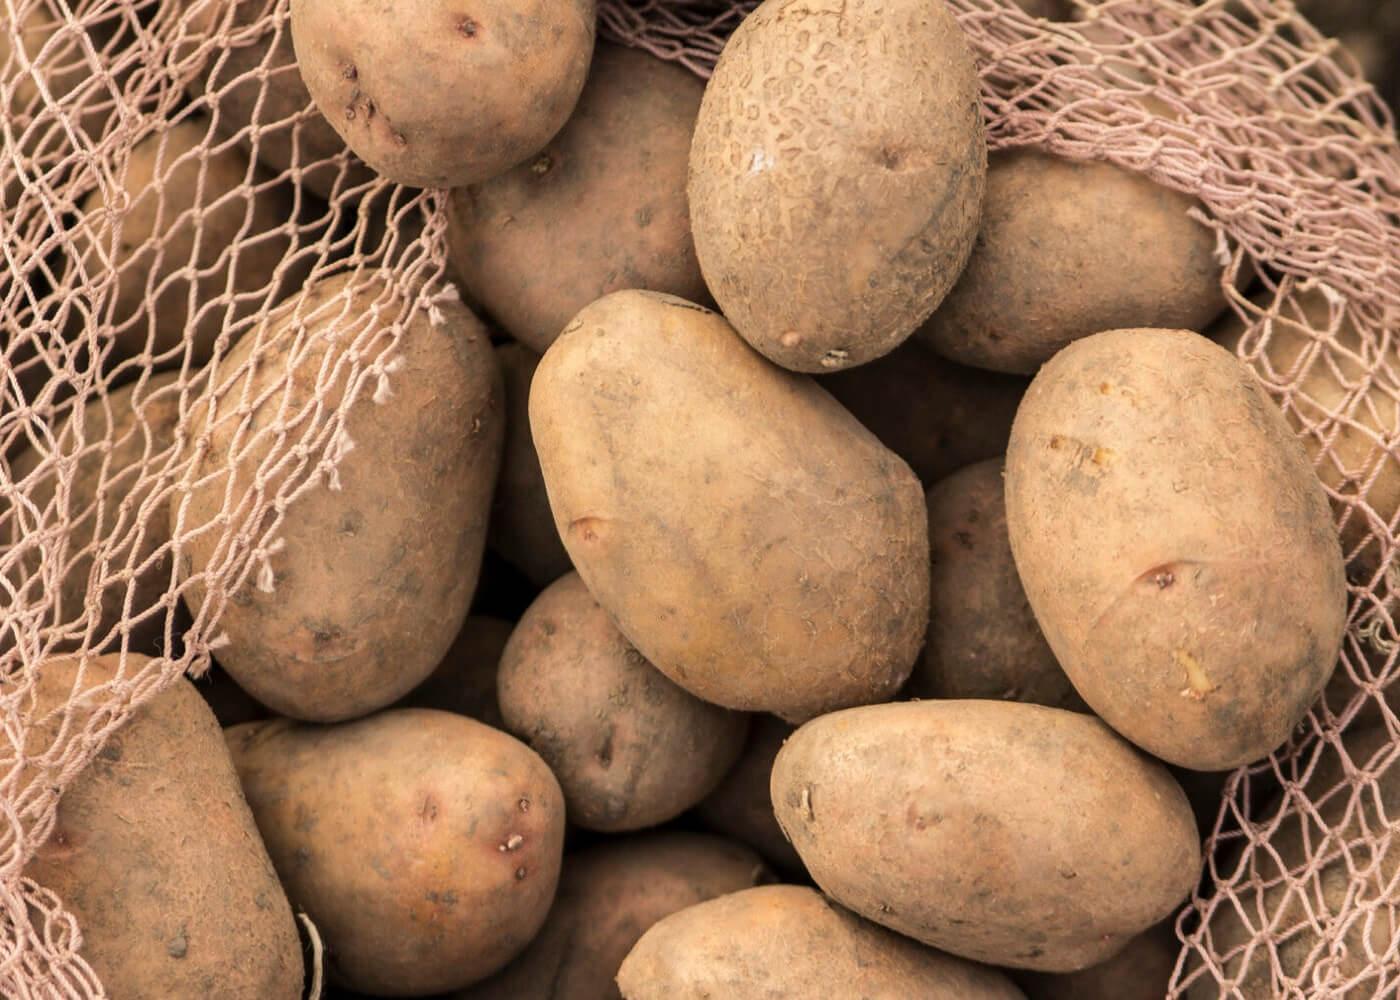 4.1.1 Ulaganja u skladišne kapacitete za krumpir